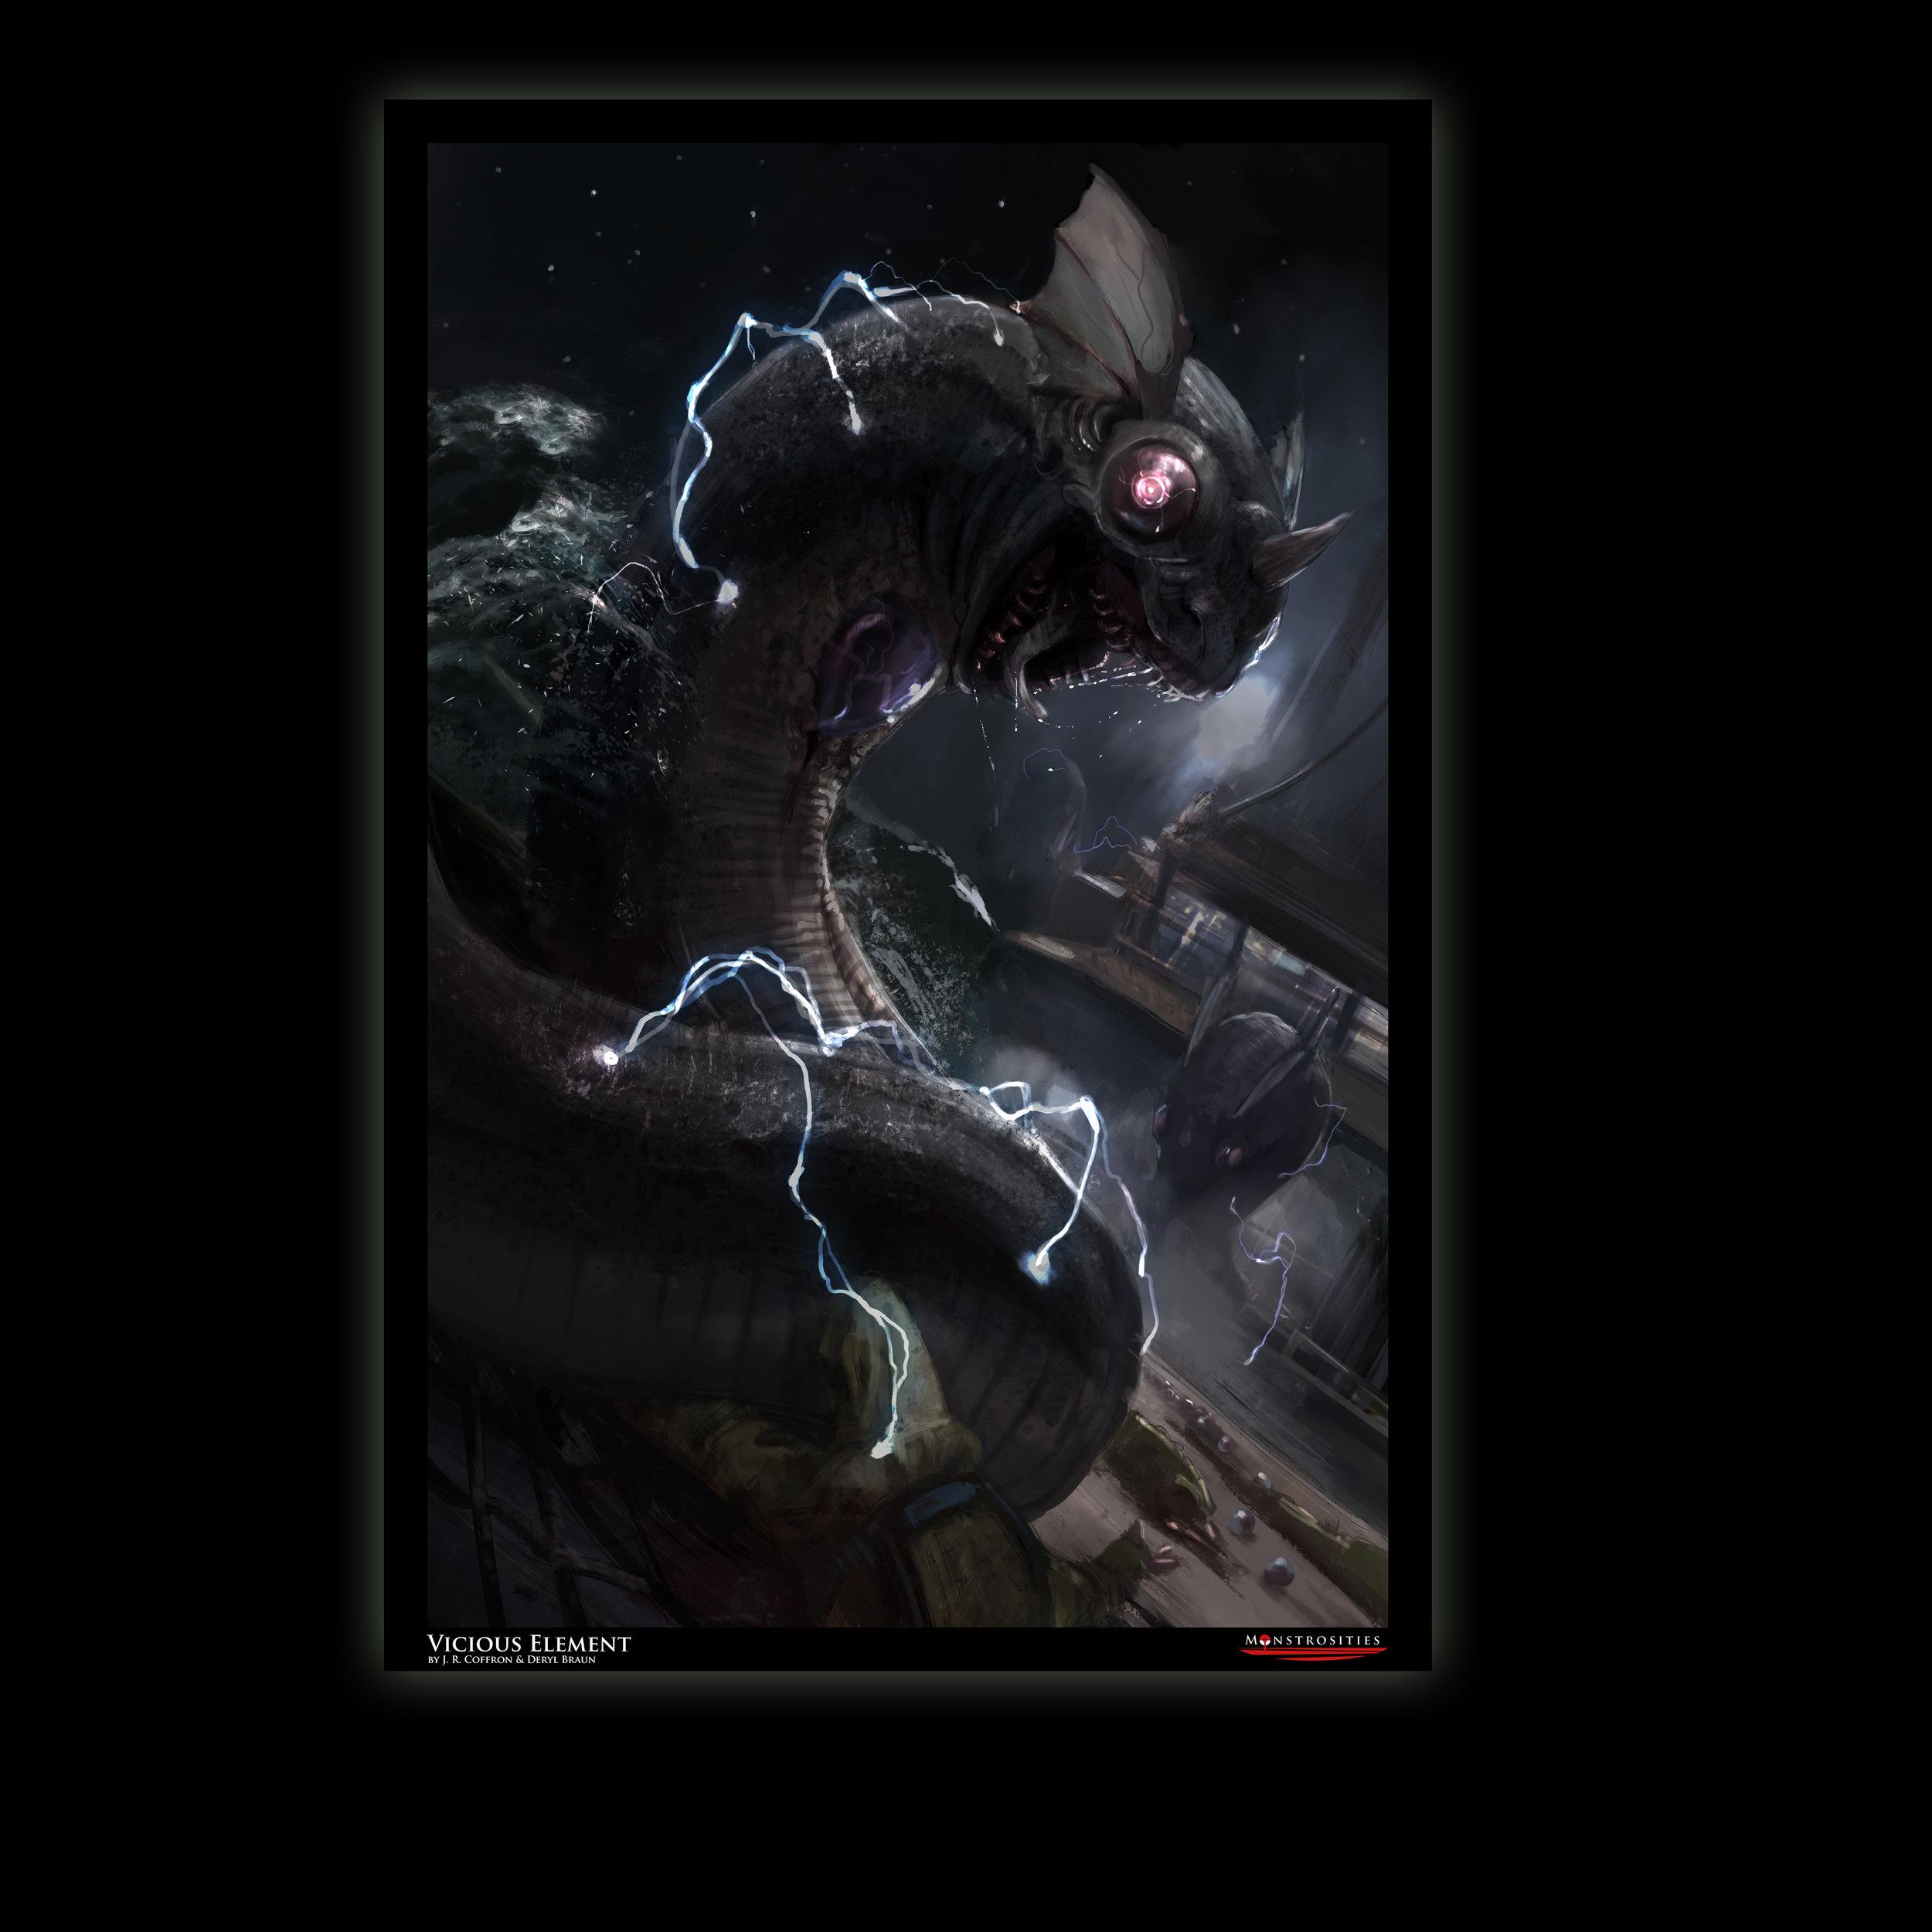 Dragonair_Unlimited_print_BLKborder.jpg